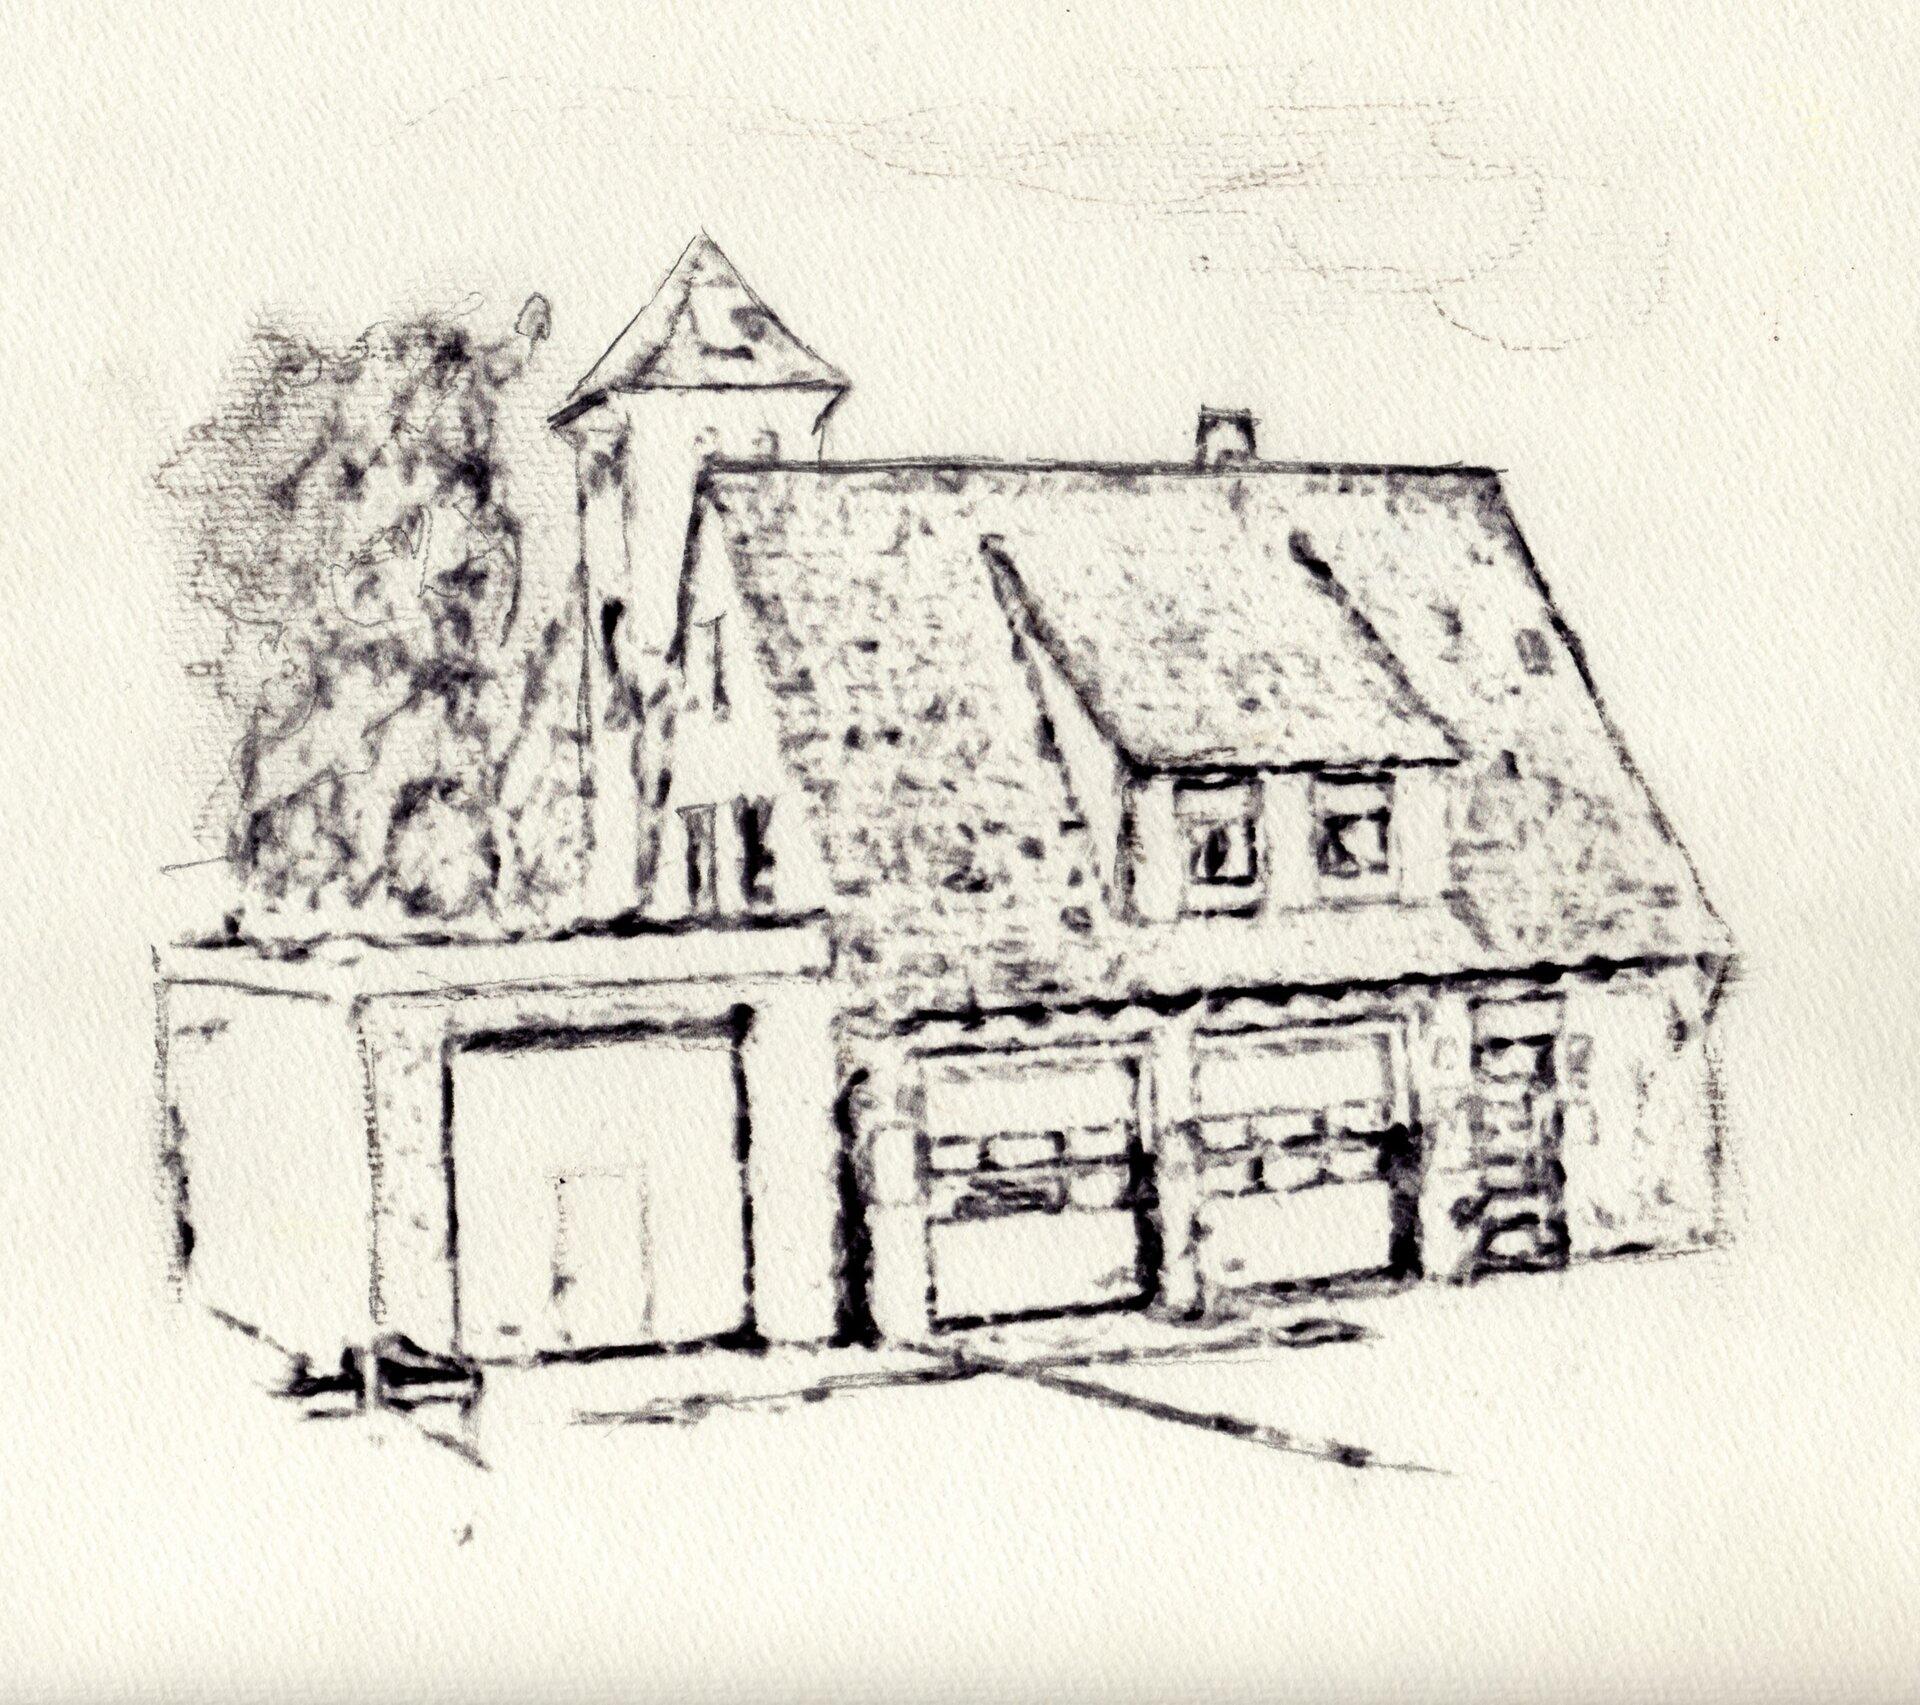 Feuerwehrhaus Tettens